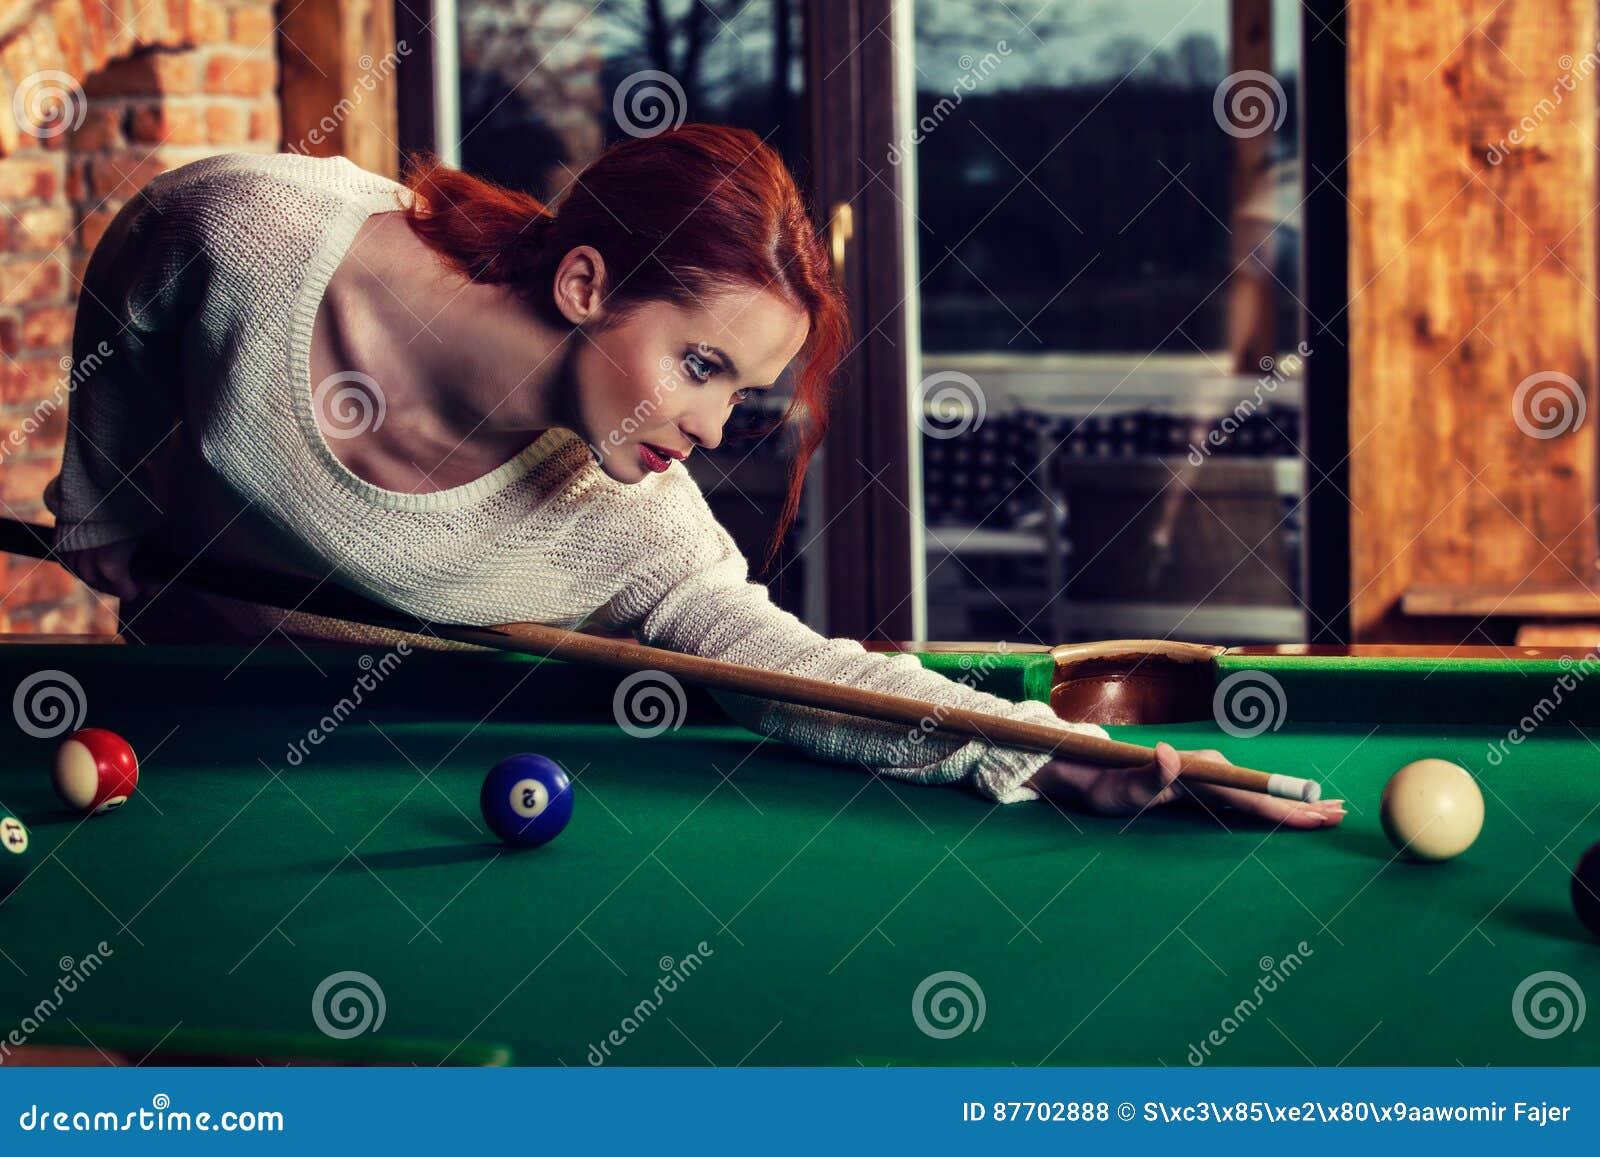 La jeune femme attirante joue le jeu de la table de billard de billard Amusement et concept de concurrence